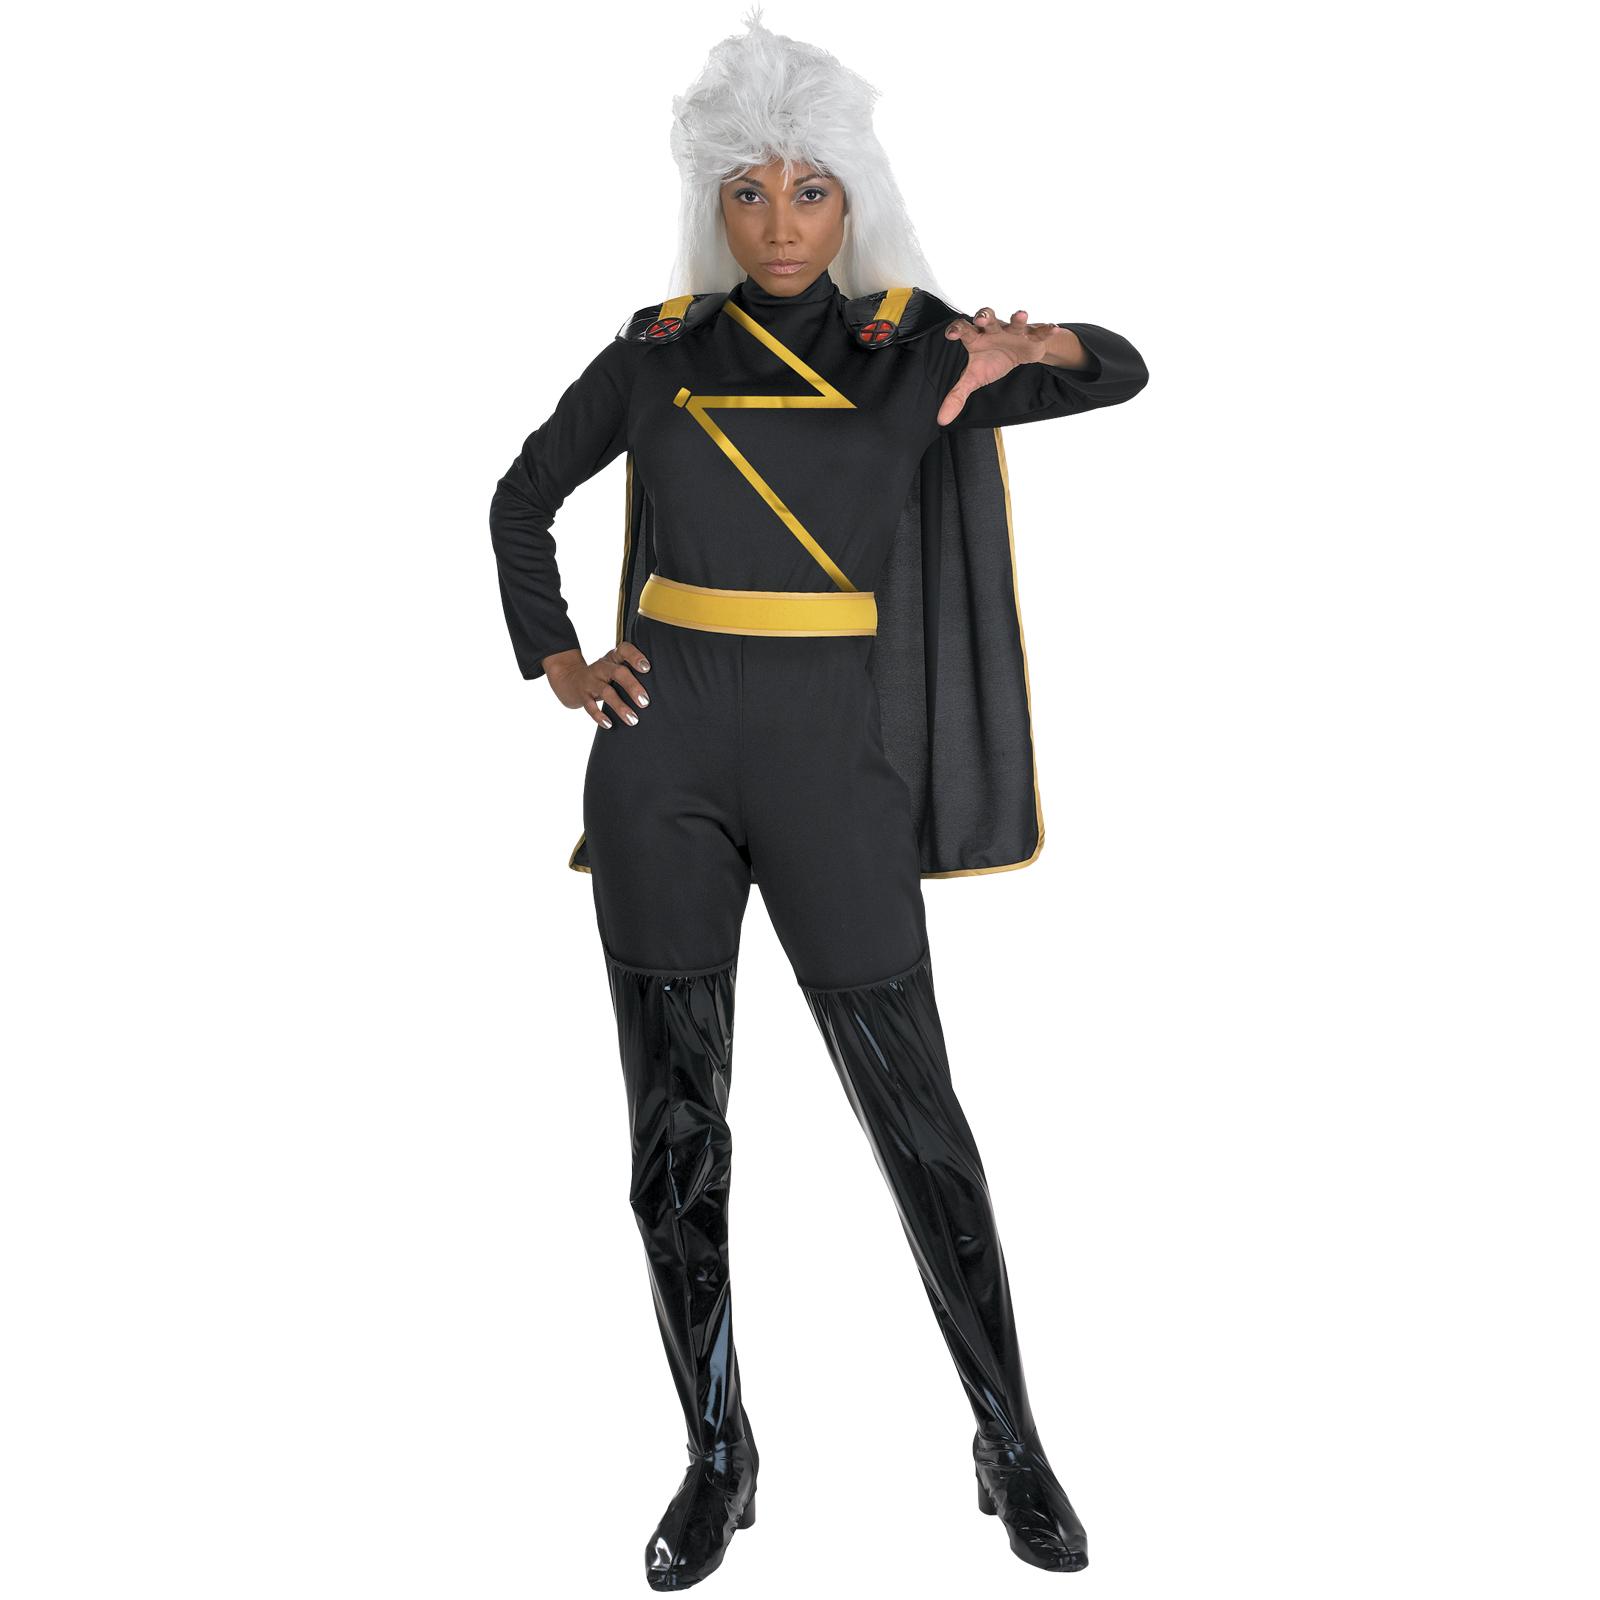 Storm X Men Costumes For Women X-men marvel storm adultX Men Storm Costume